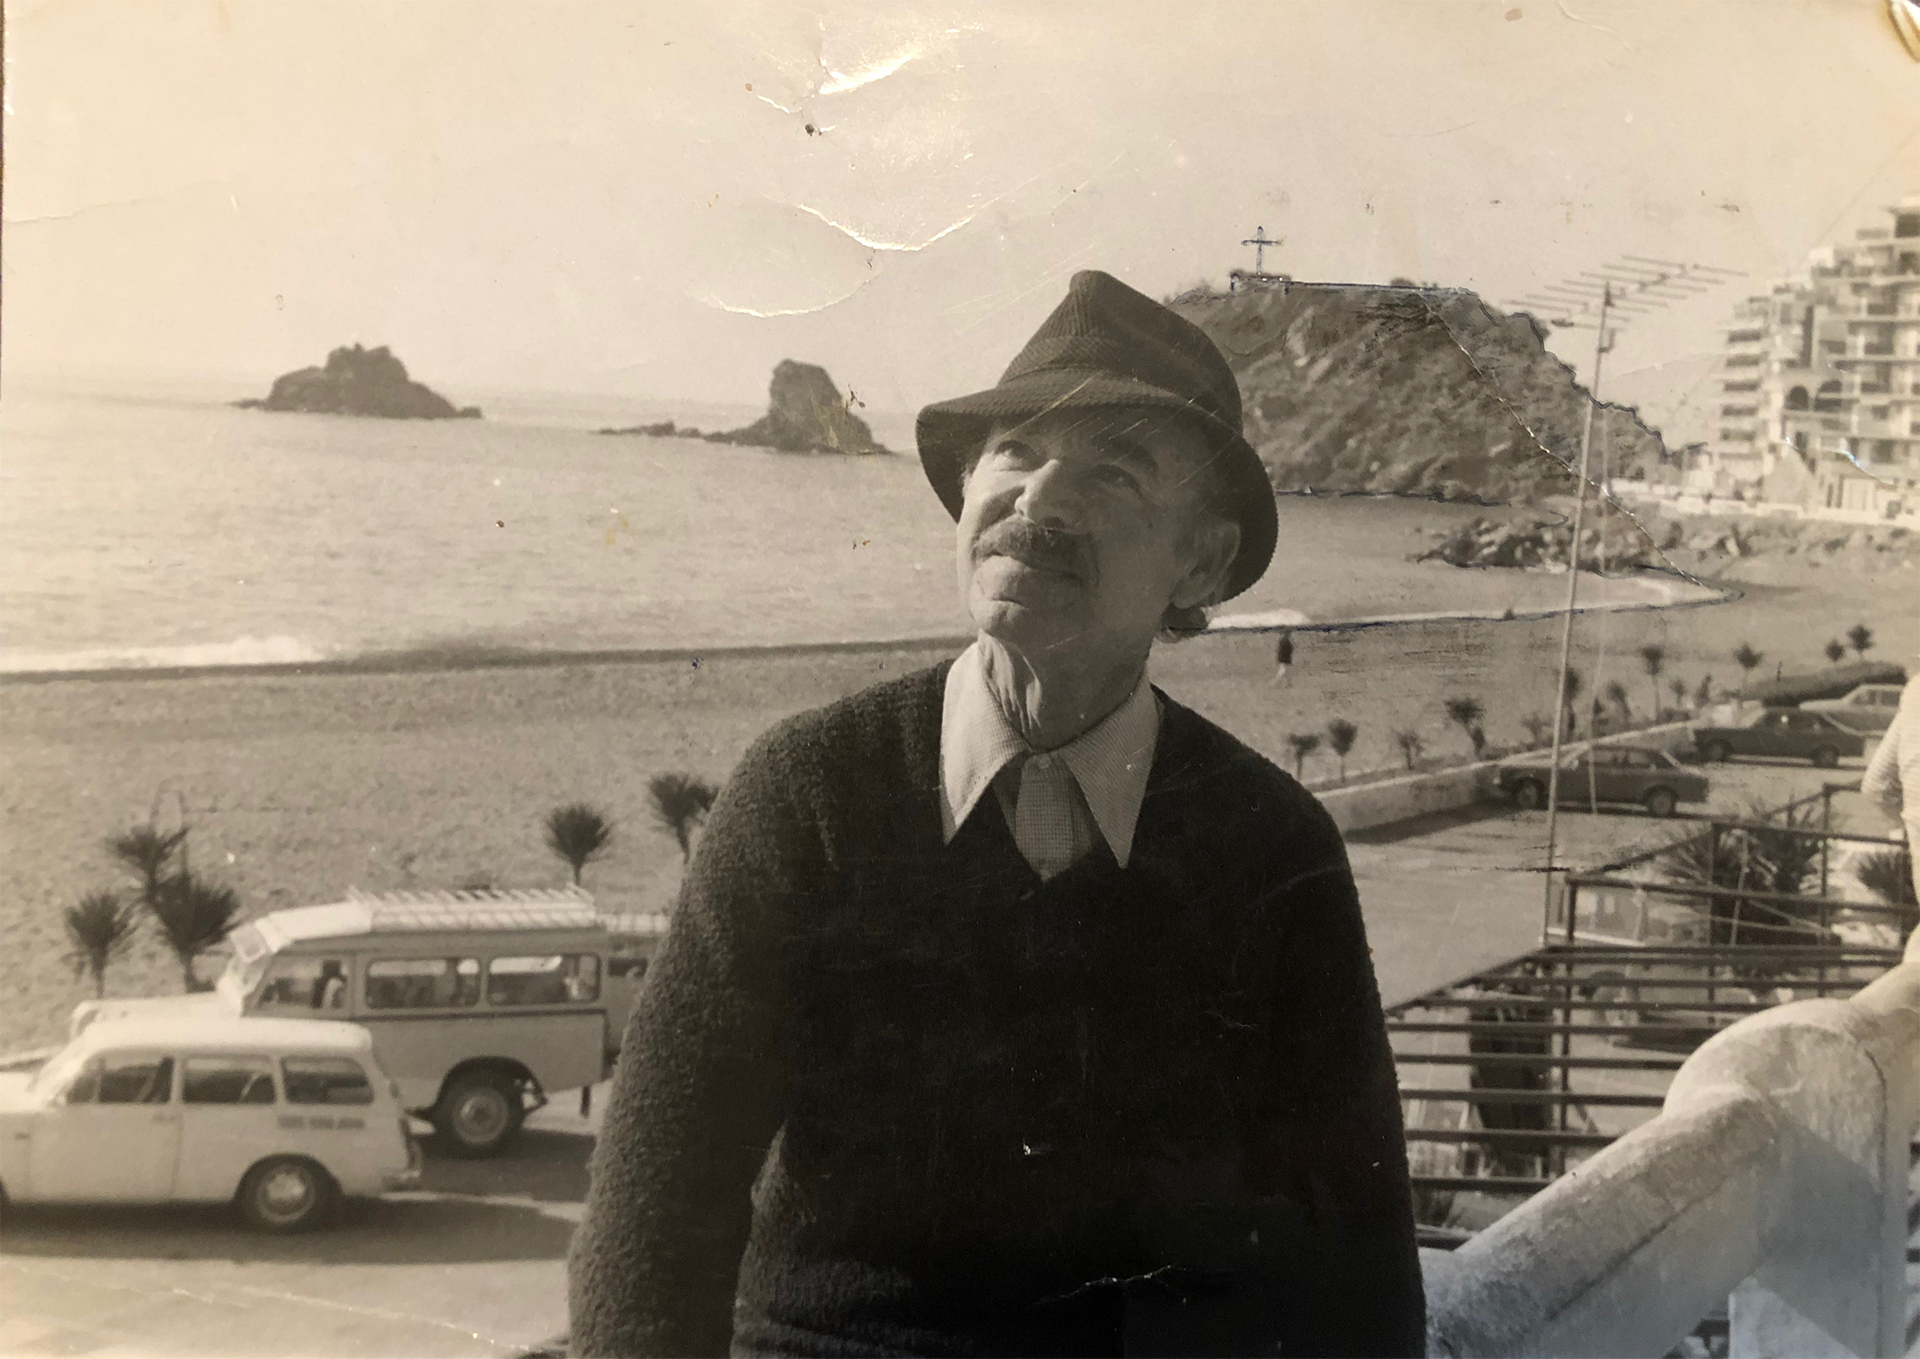 Alexander Goodman in Almenecar, Spain 1978